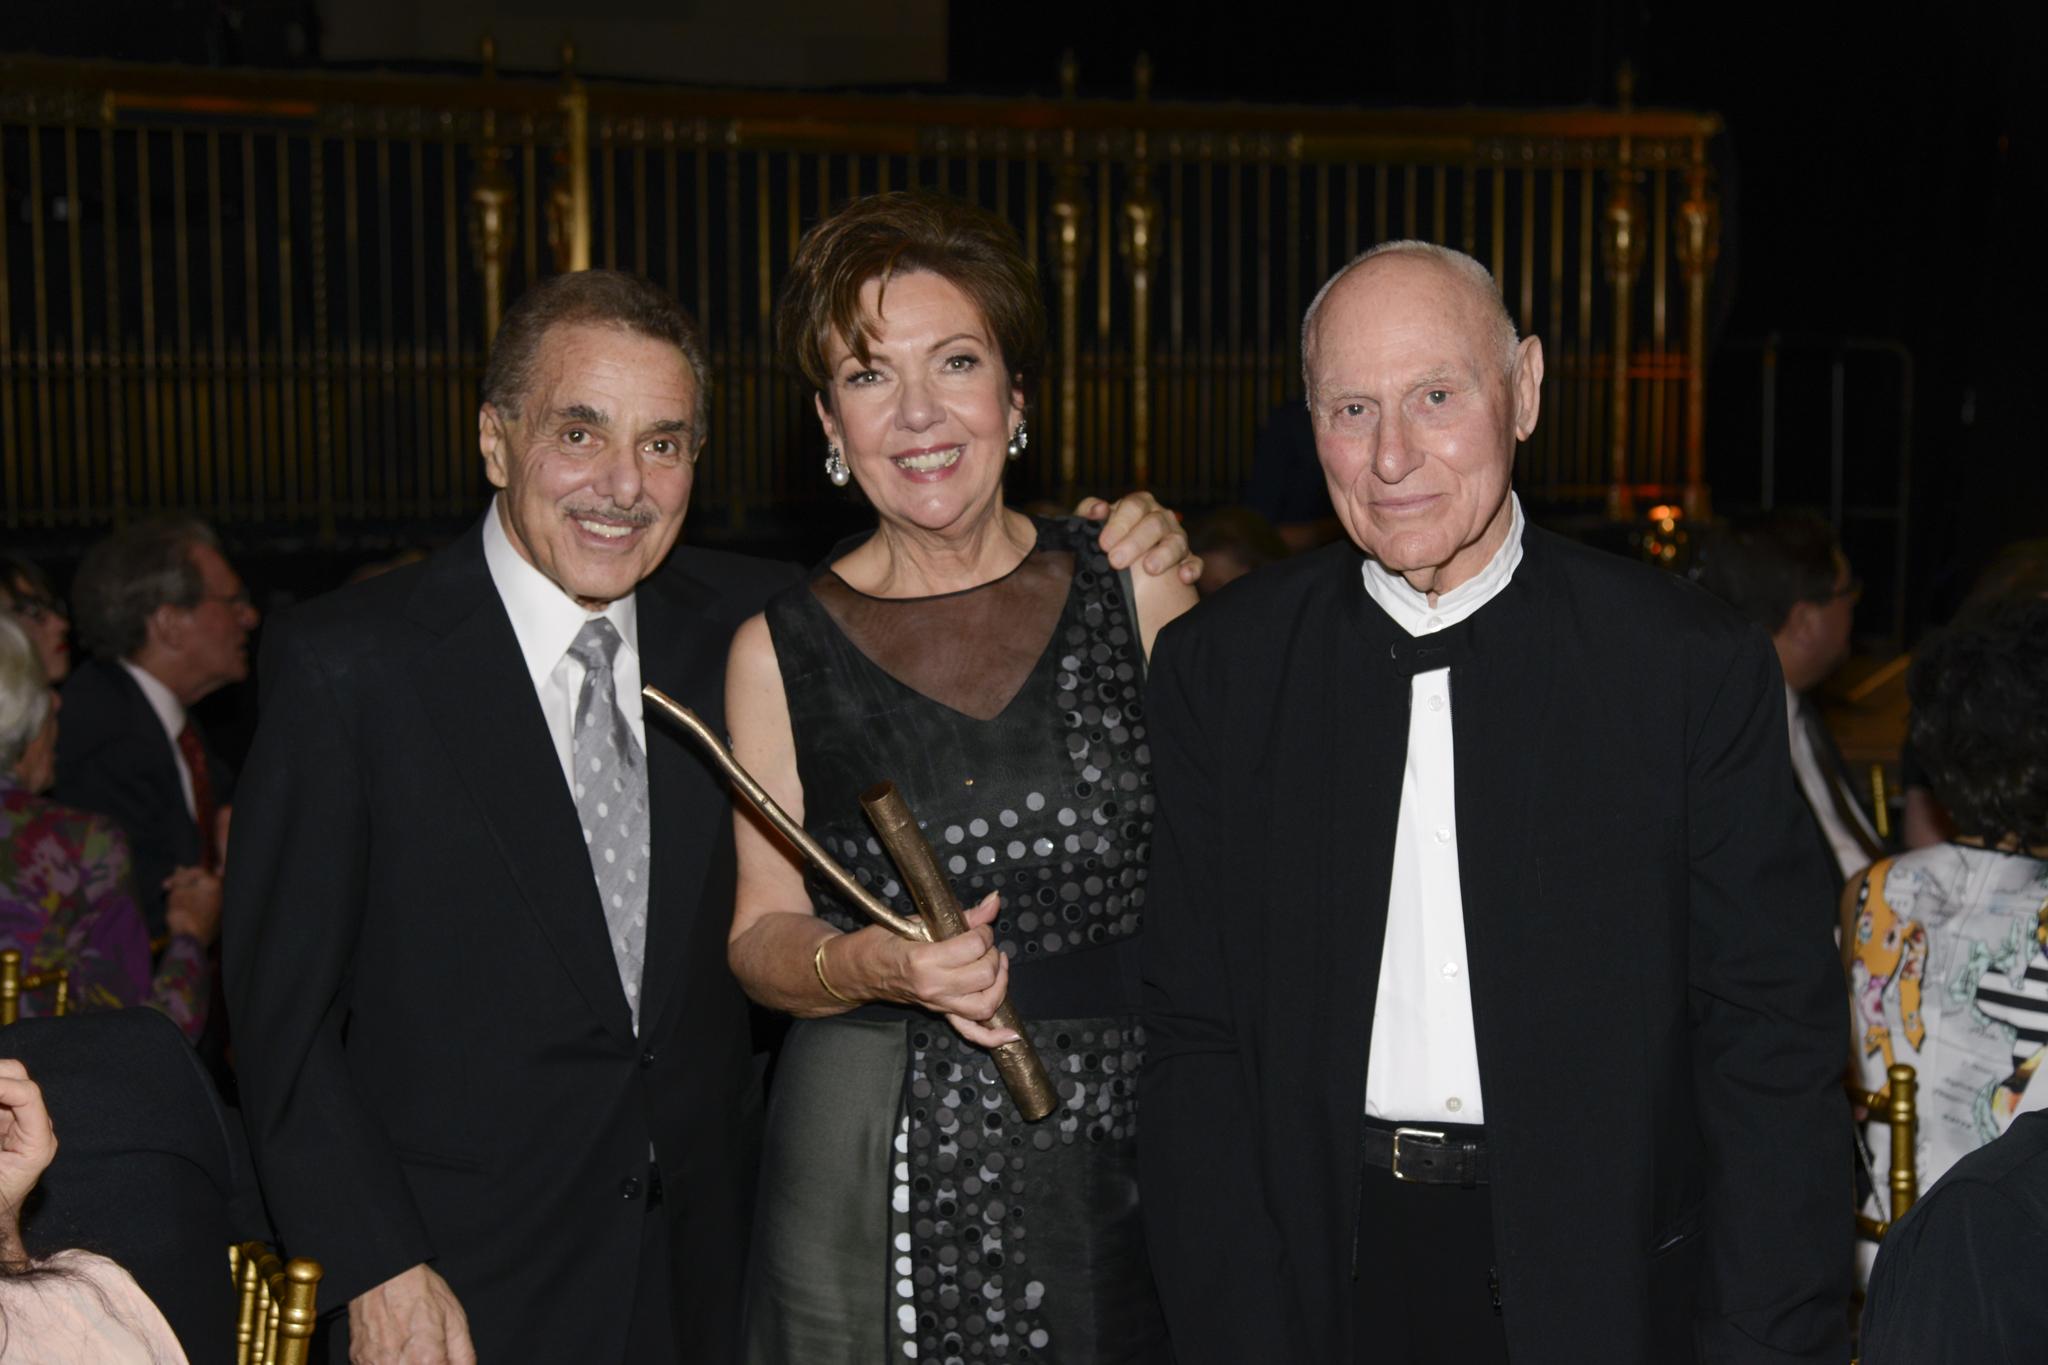 Len&Louise Riggio_RichardSerra_Skowhegan birch medal.jpg